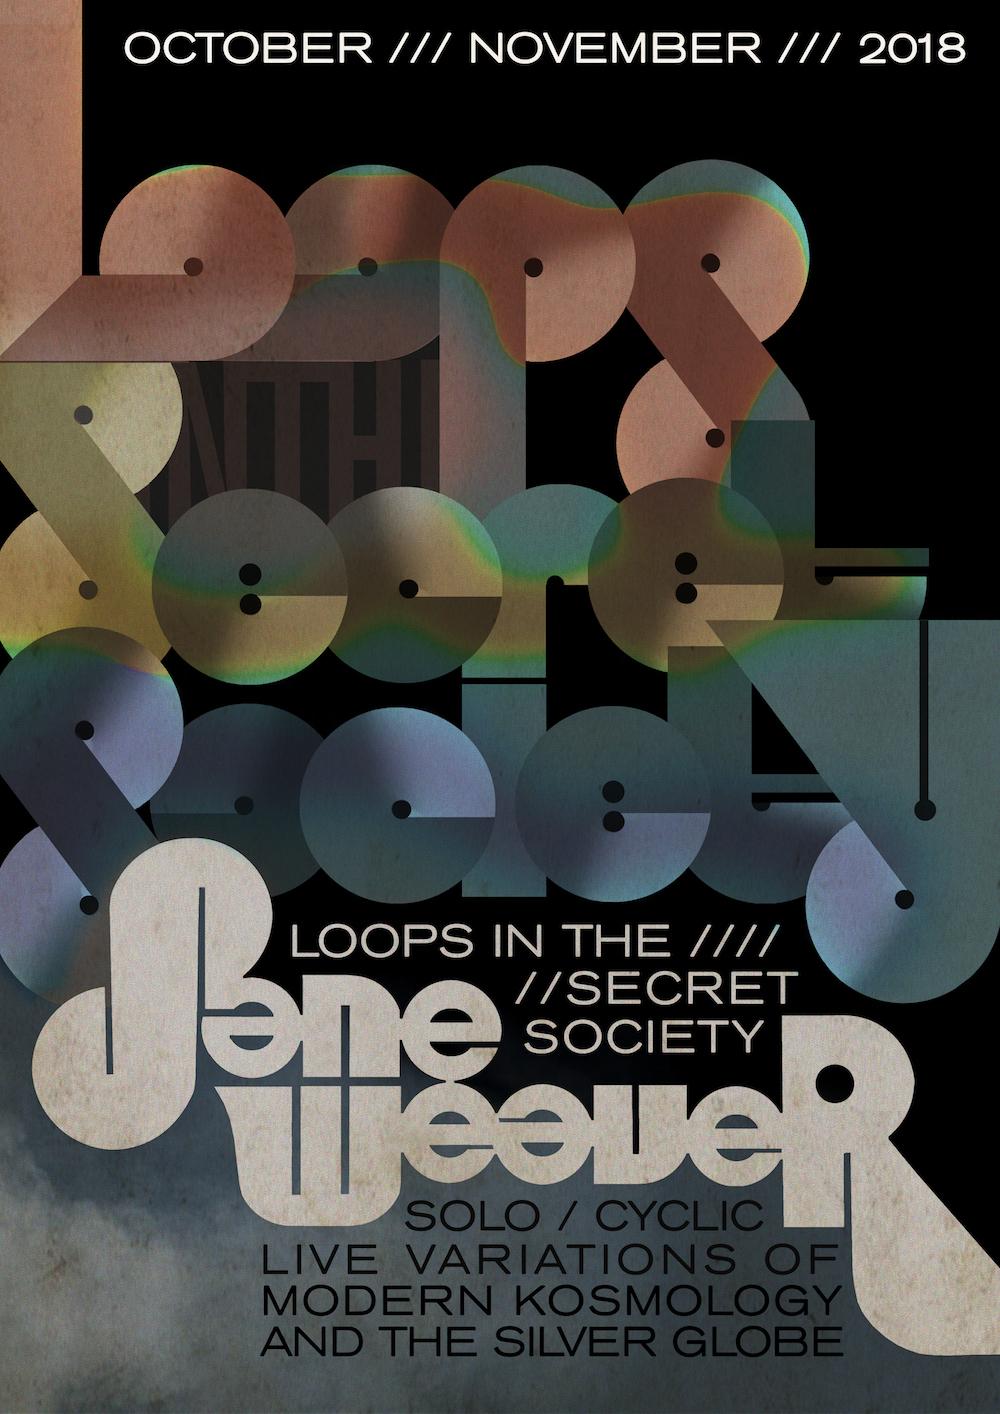 Secret society london